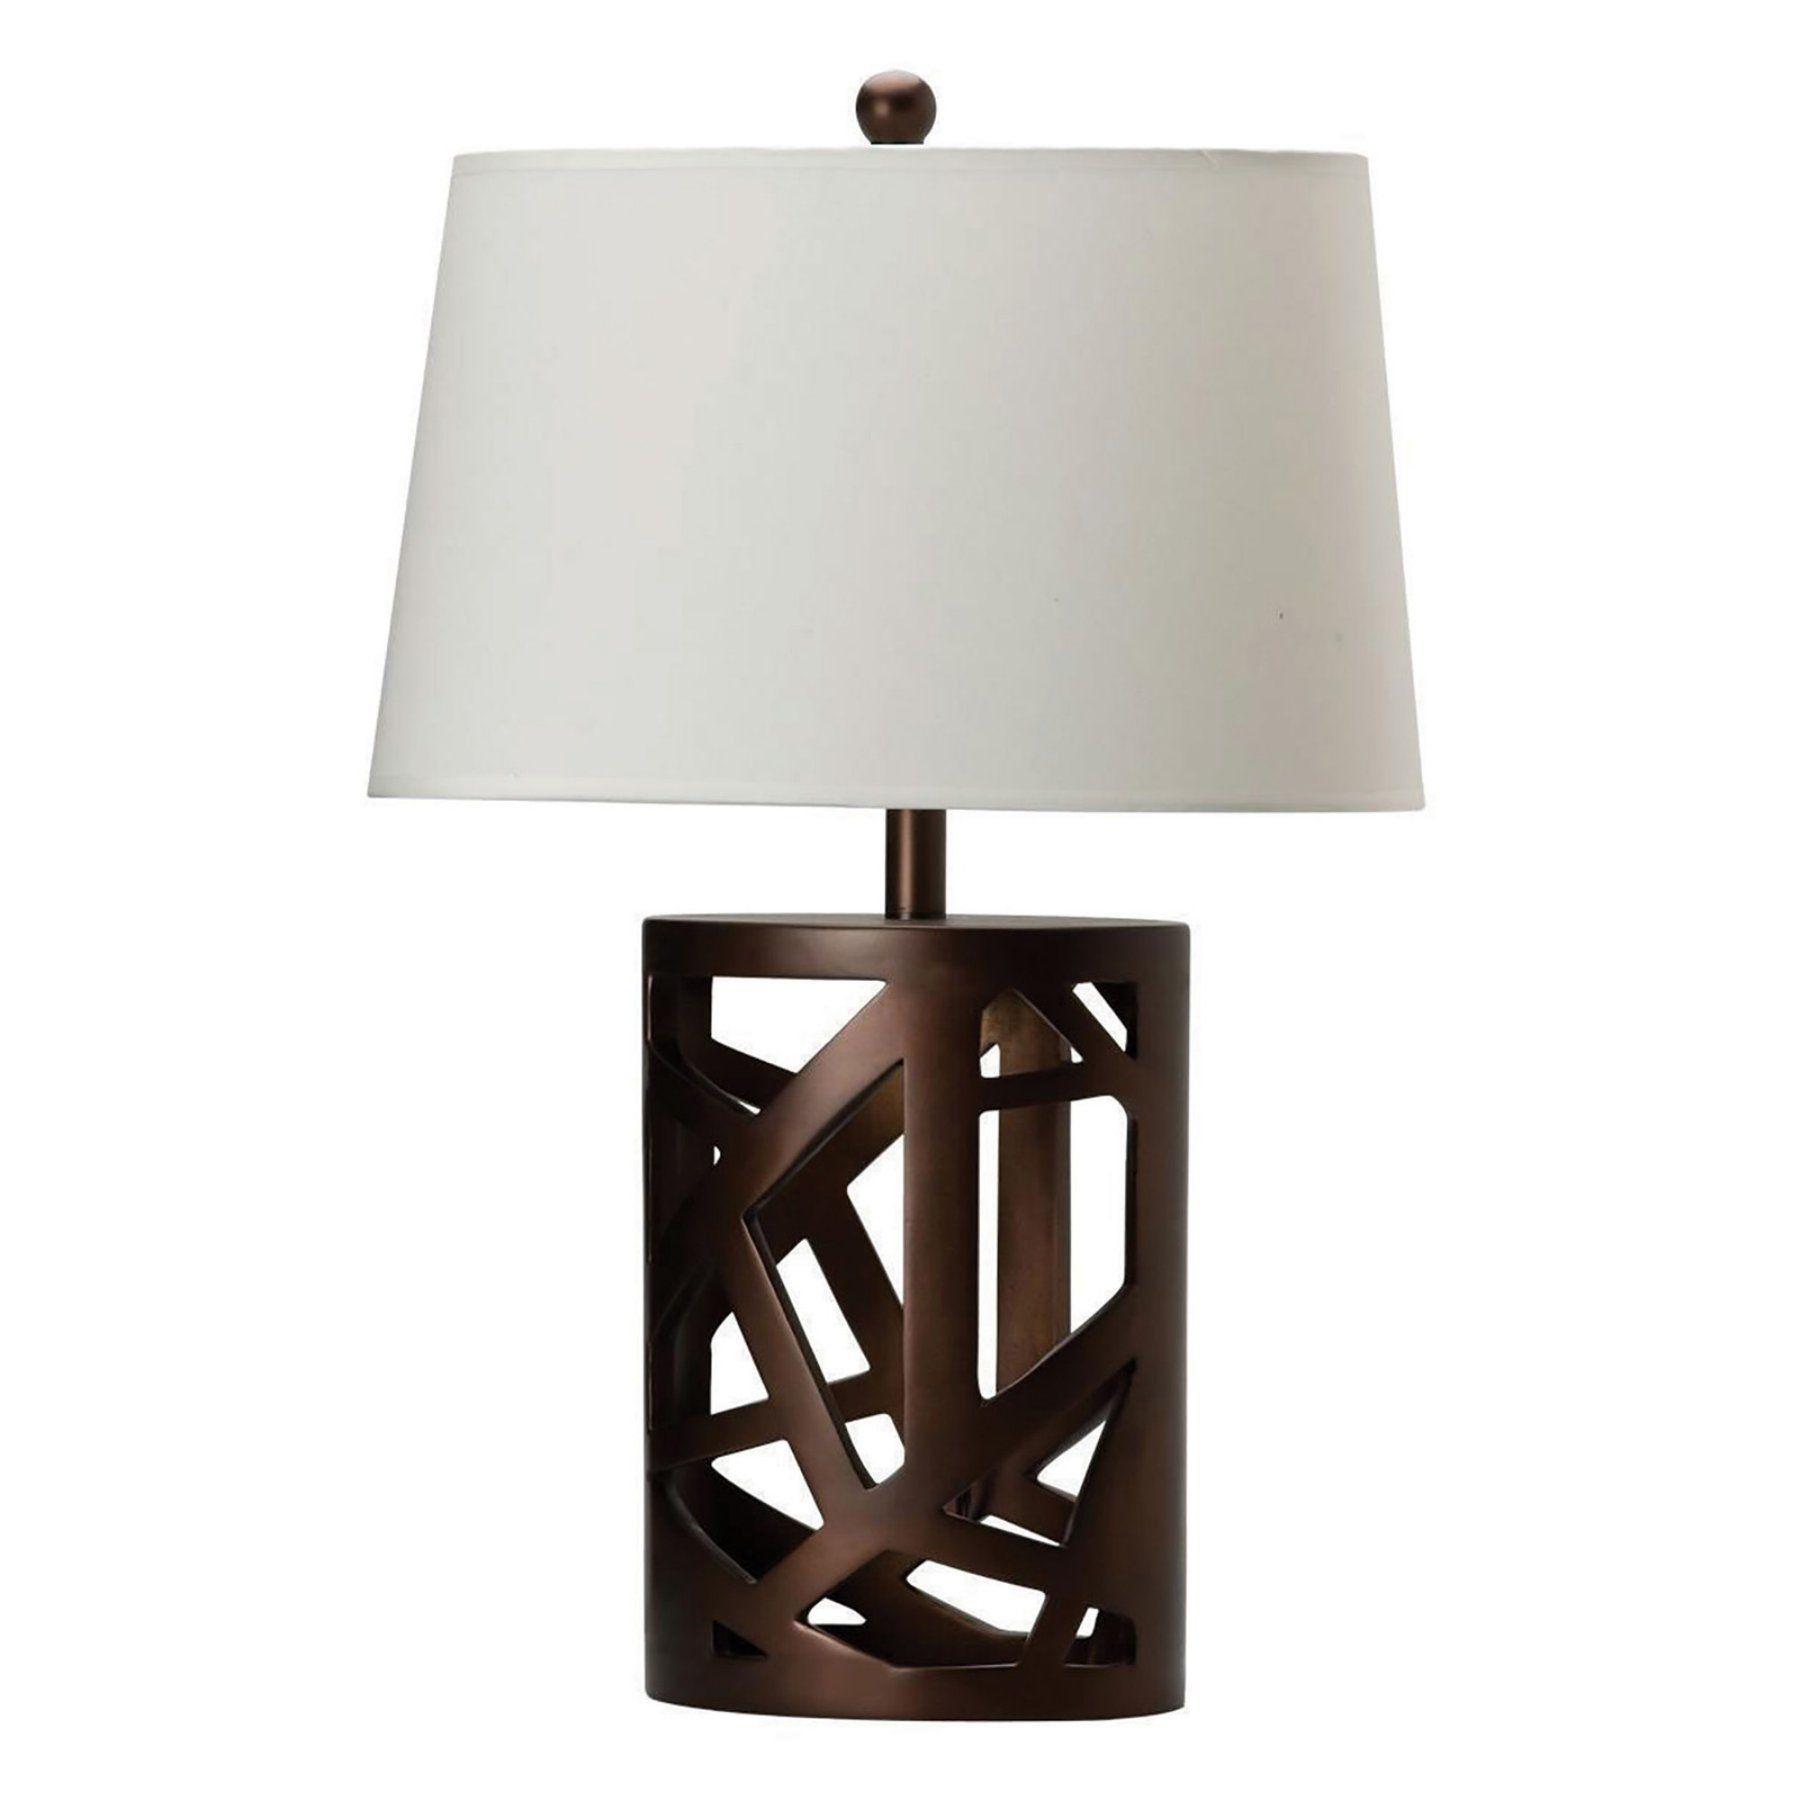 Coaster Company Of America 901256 Table Lamp